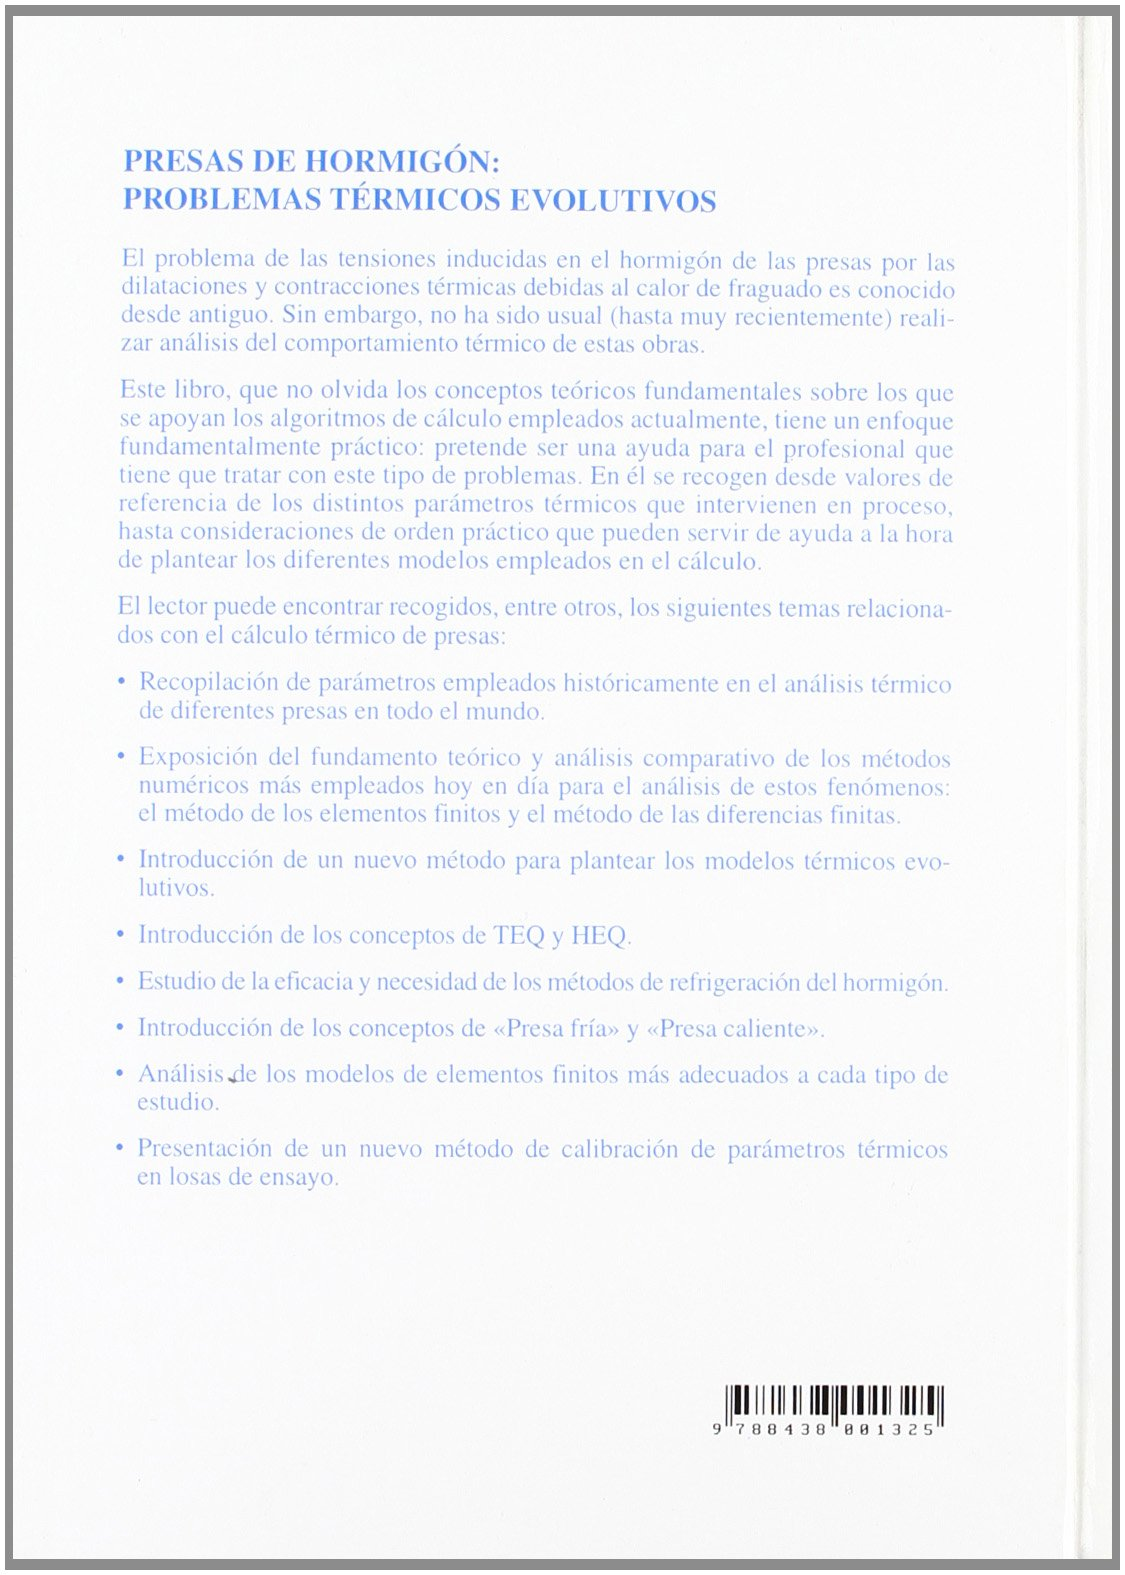 Presas de hormigón : problemas térmicos evolutivos: 9788438001325: Amazon.com: Books